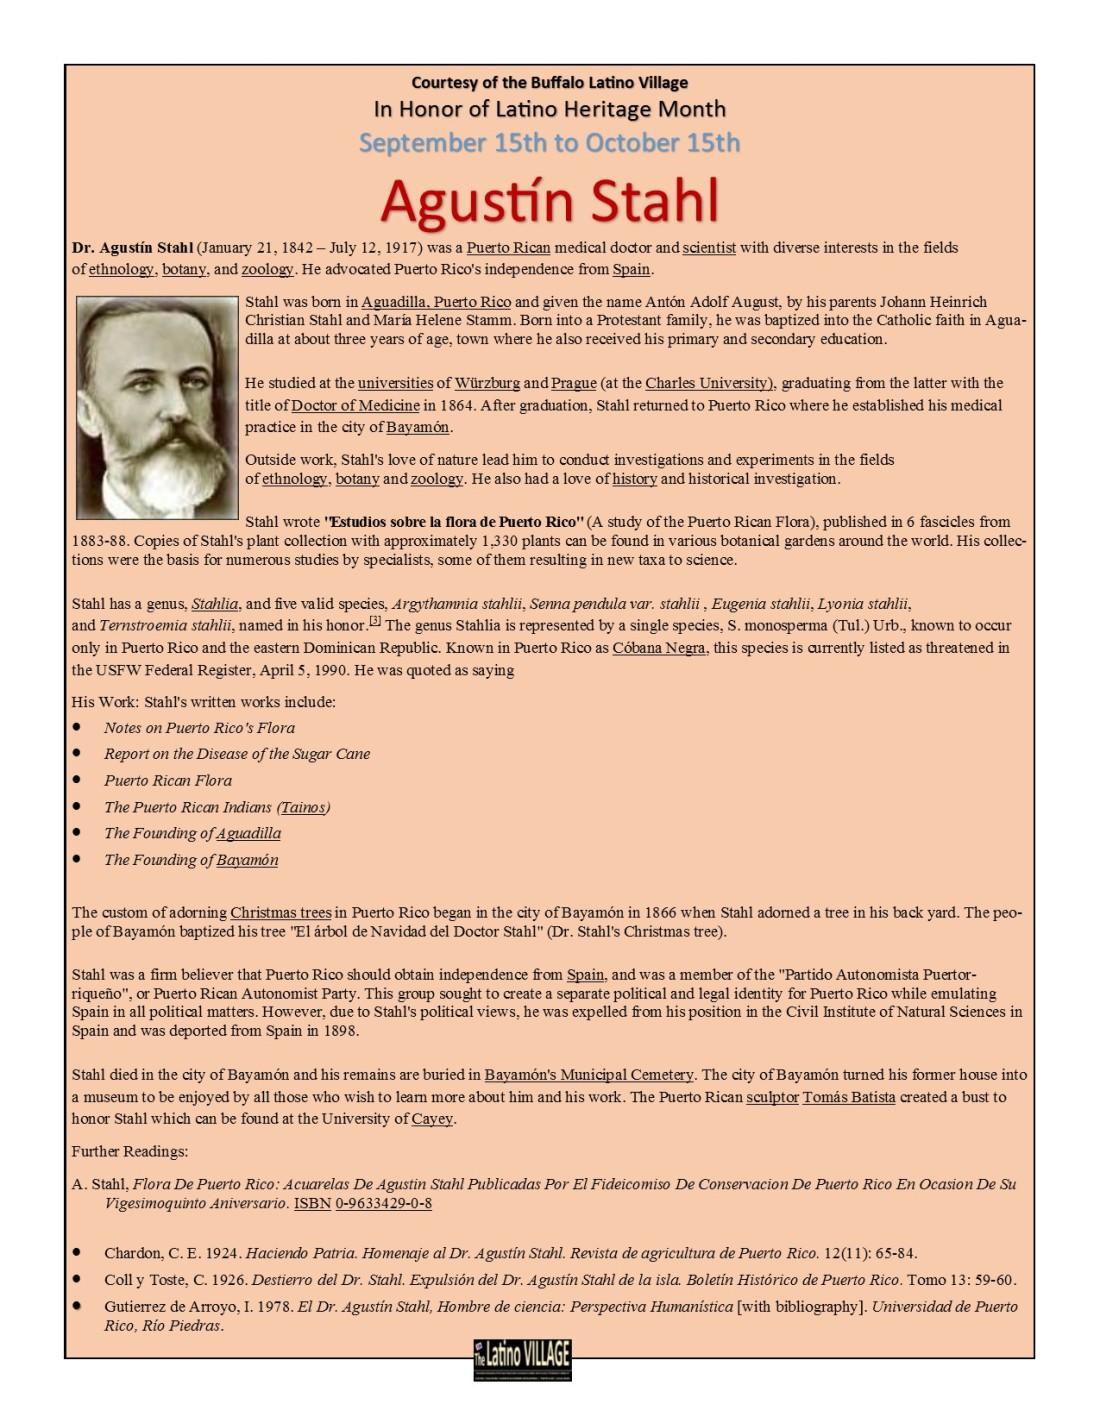 Agustin Stahl